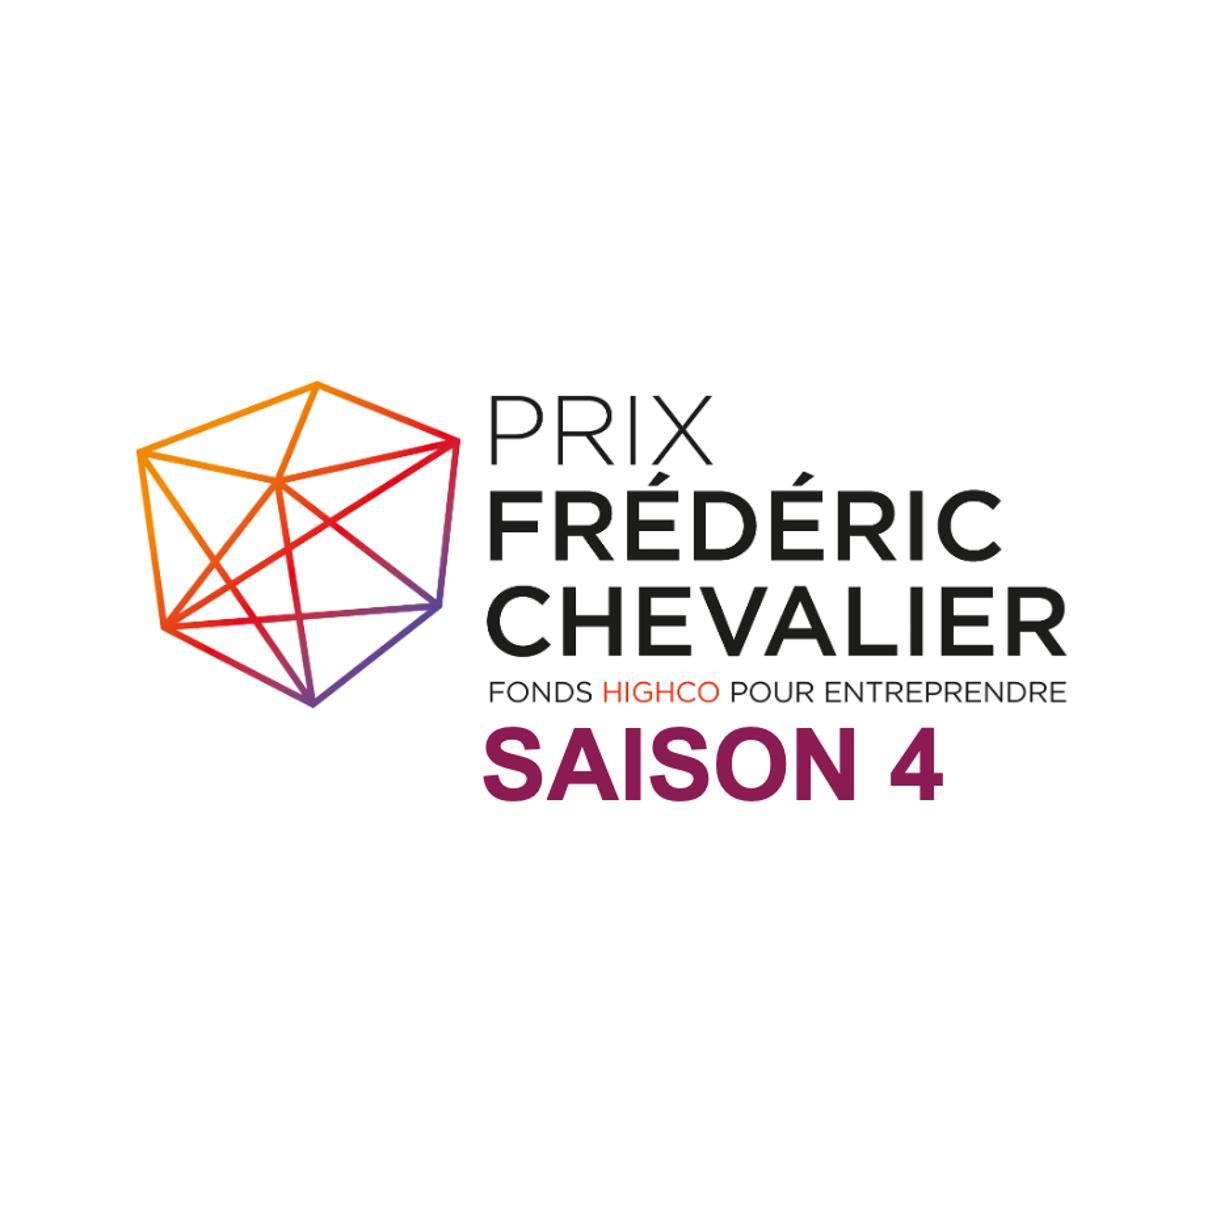 Prix Frédéric Chevalier-HighCo / Saison 4